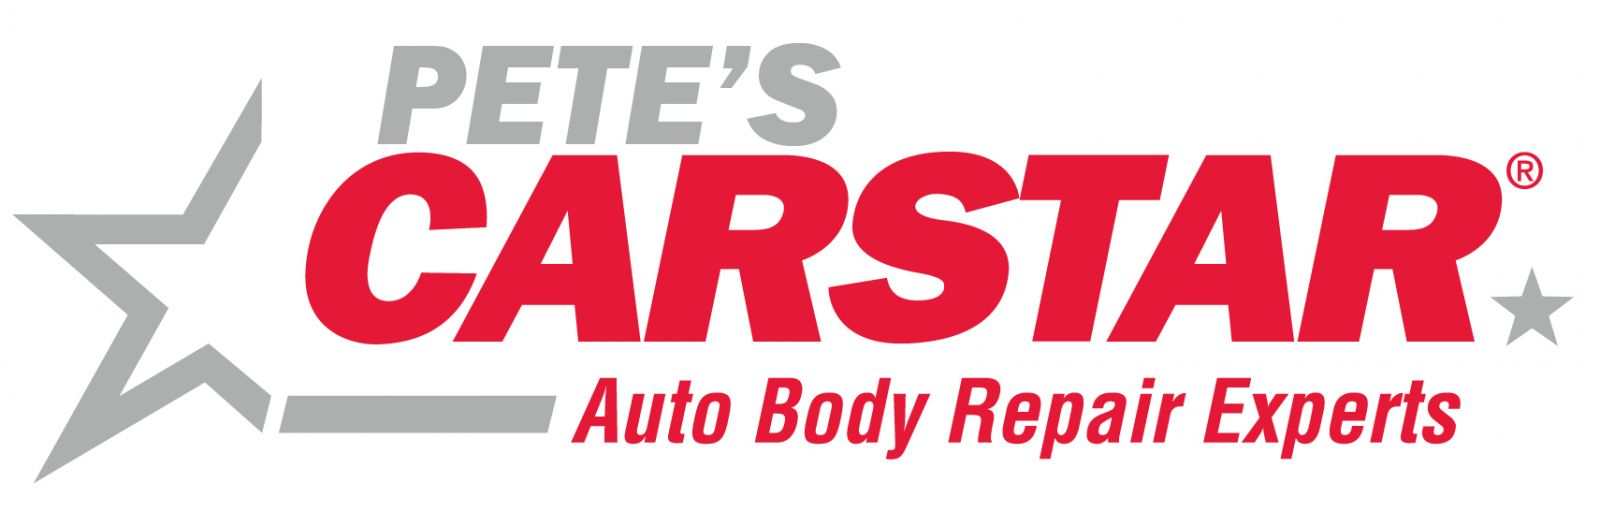 Pete's CARSTAR: Logo